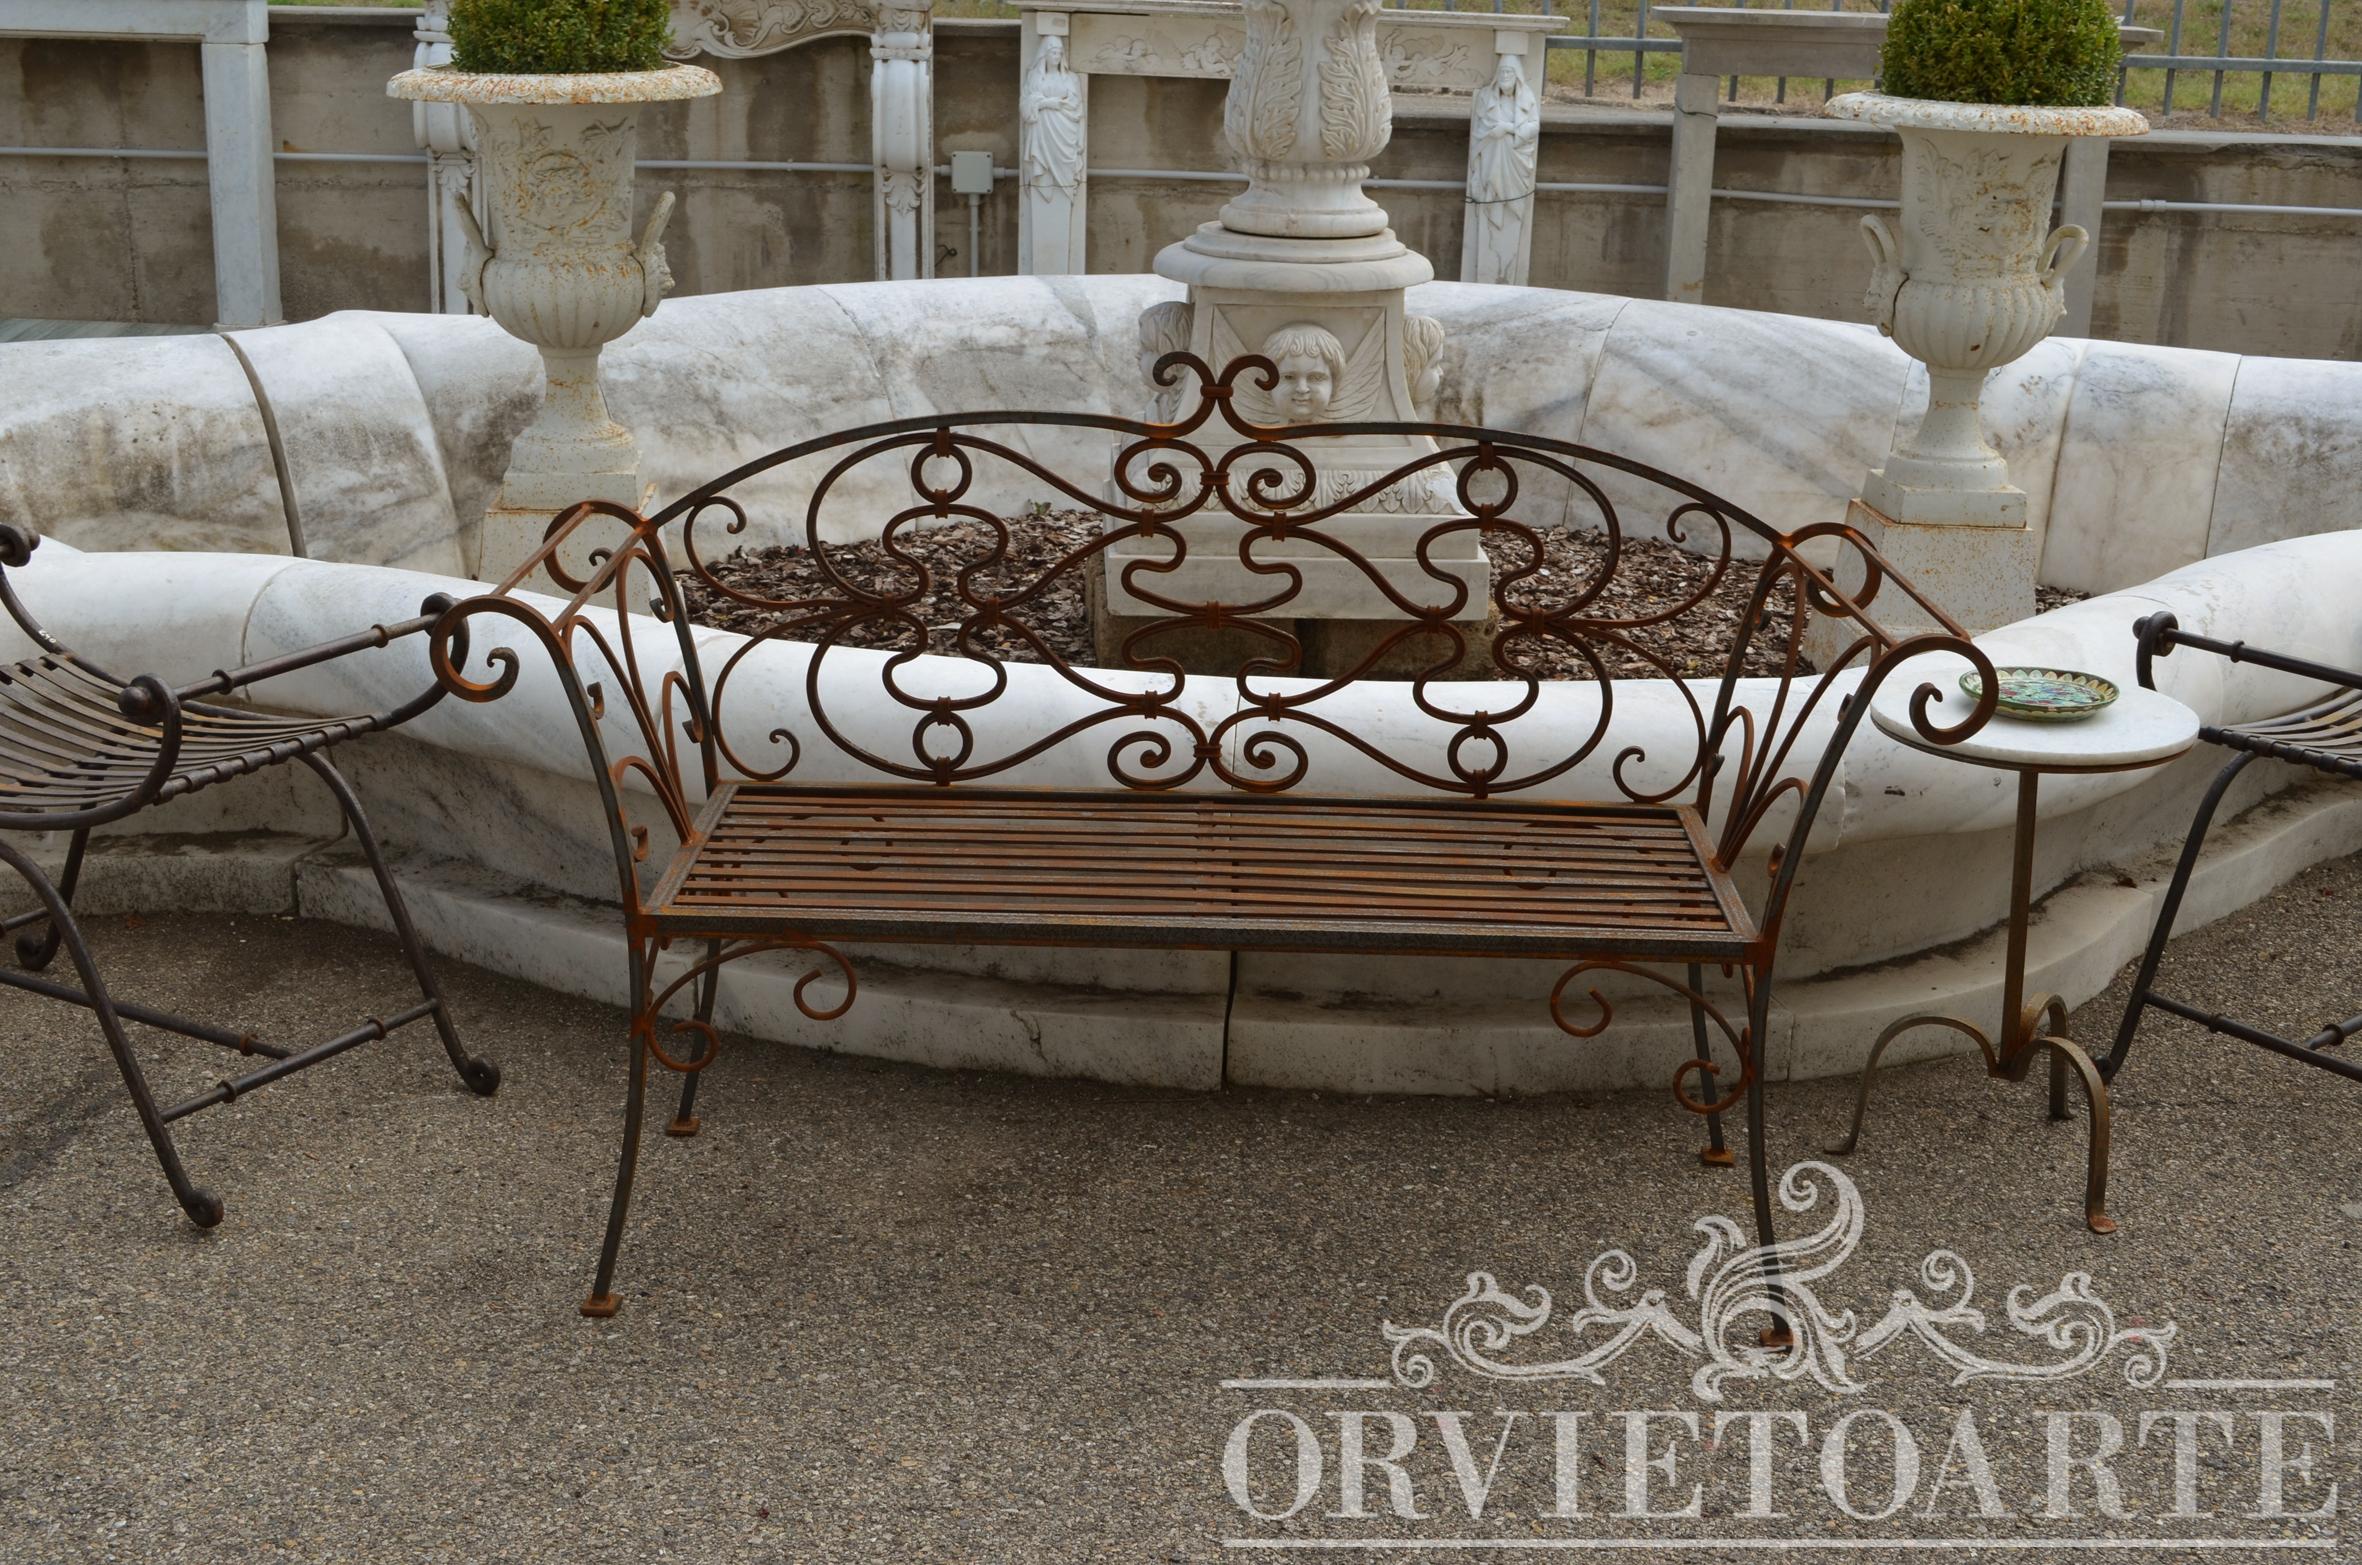 Orvieto arte panchina in ferro battuto for Arredo giardino in ferro